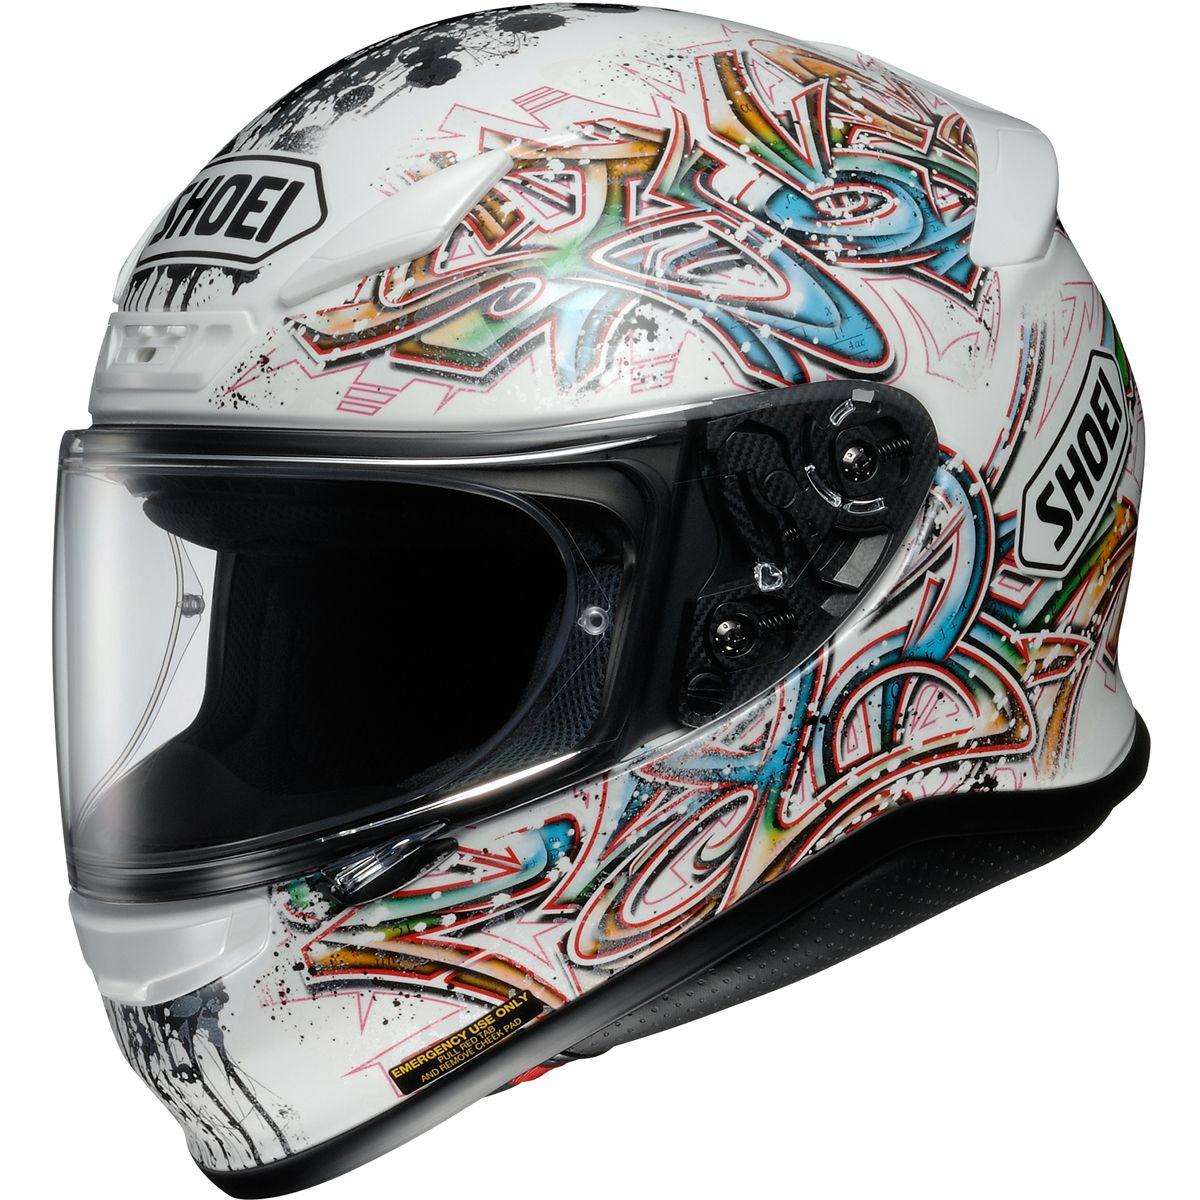 Sale On New Shoei Graffiti Rf 1200 Street Bike Racing Motorcycle